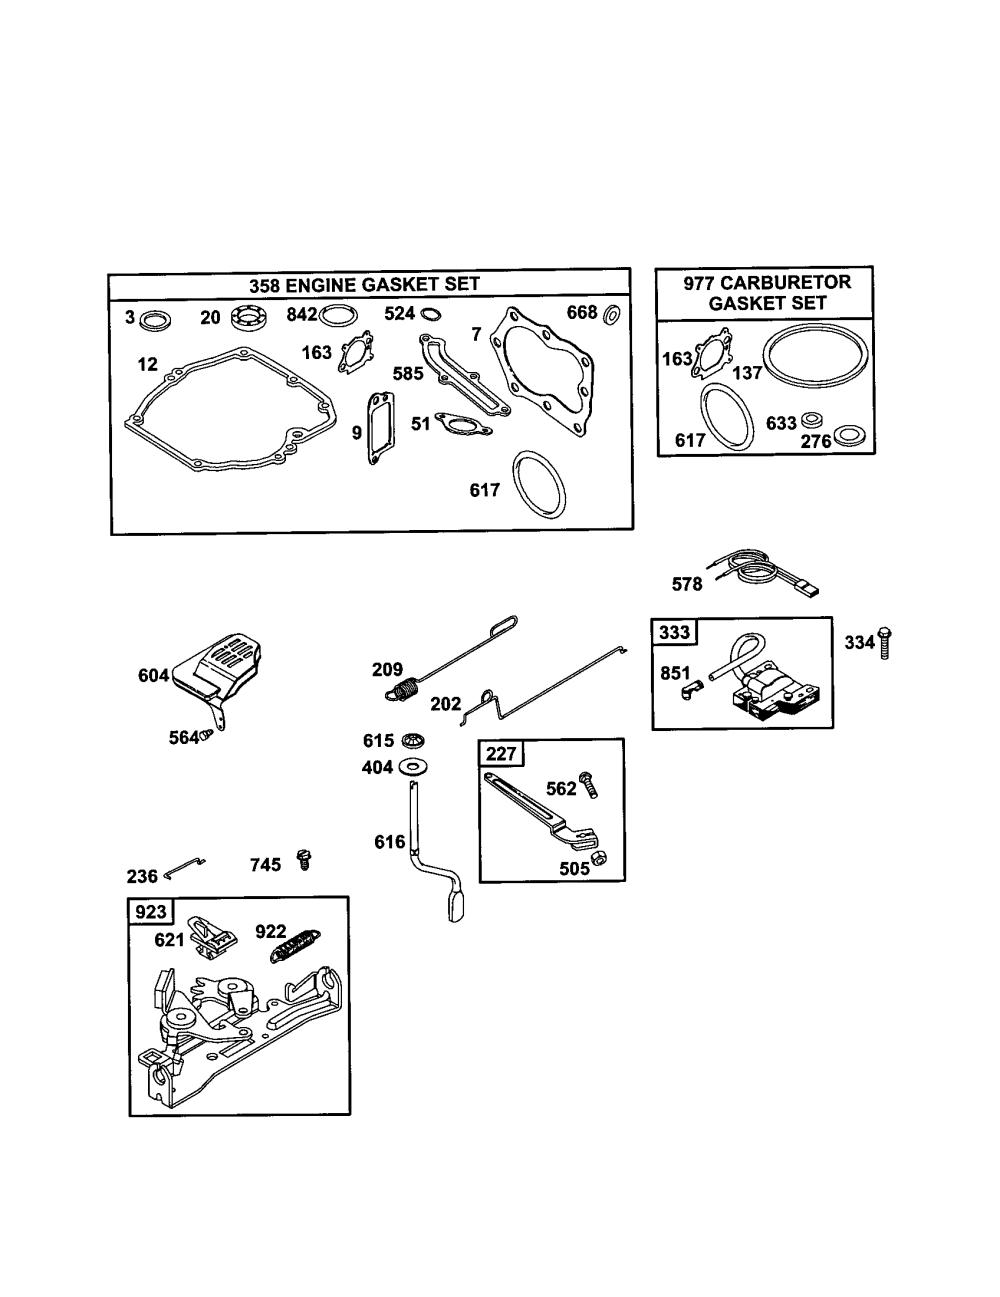 medium resolution of briggs stratton 12j802 2915 b2 engine gasket set diagram